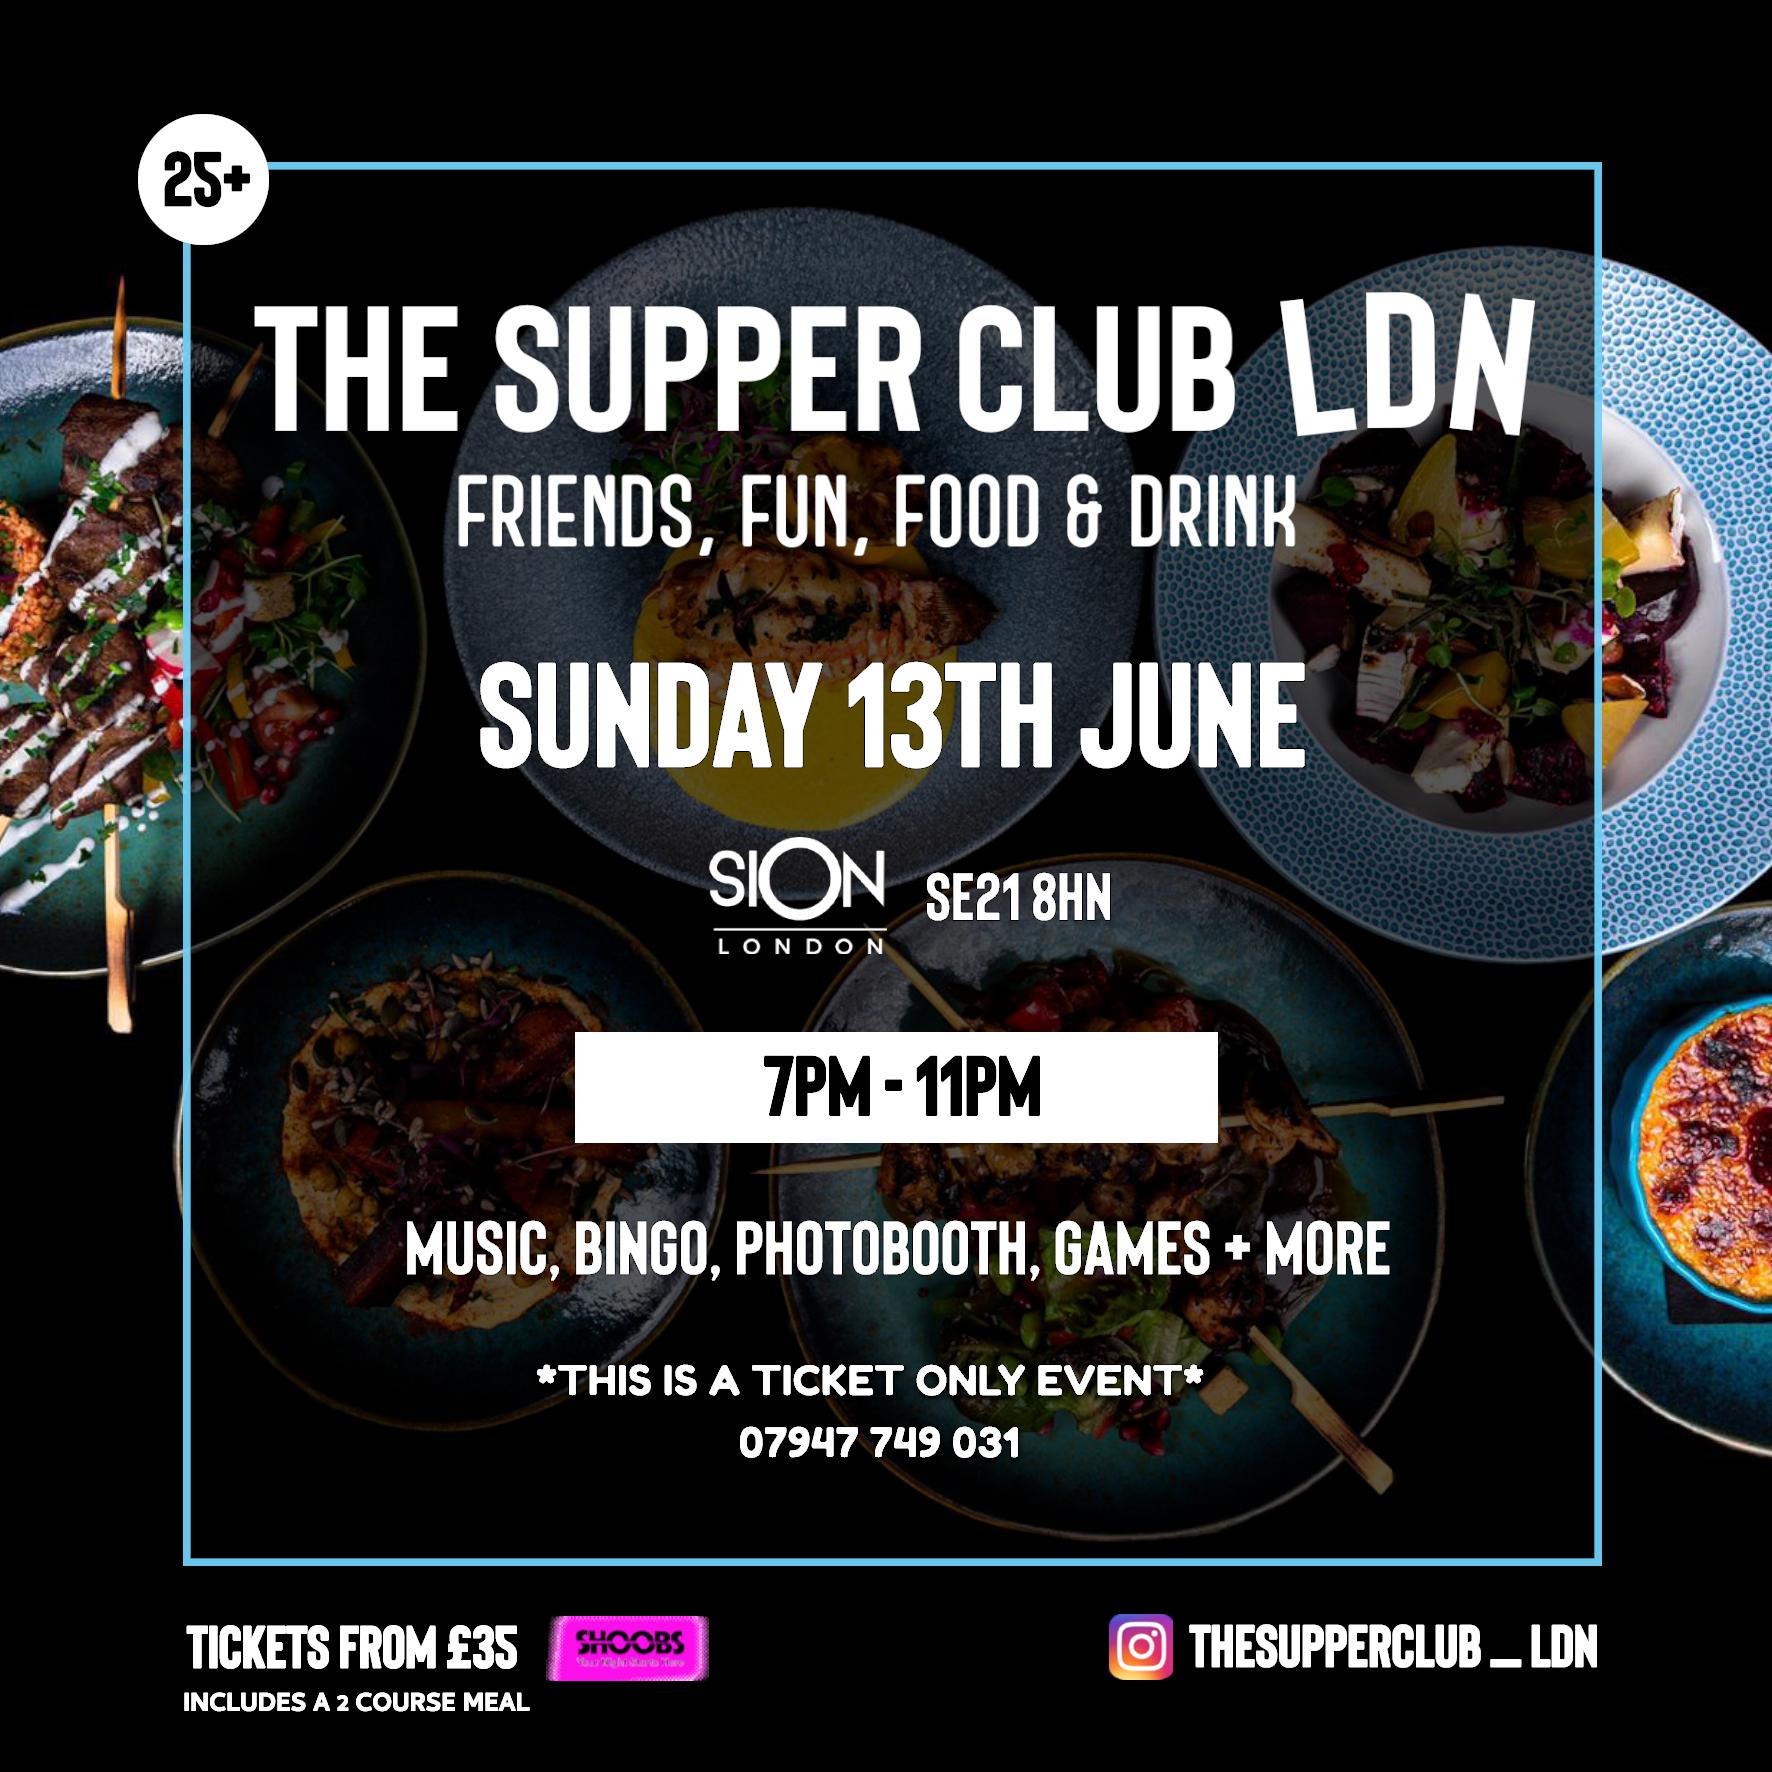 The SupperClub LDN - Sun JUNE 13TH (7pm-11pm)